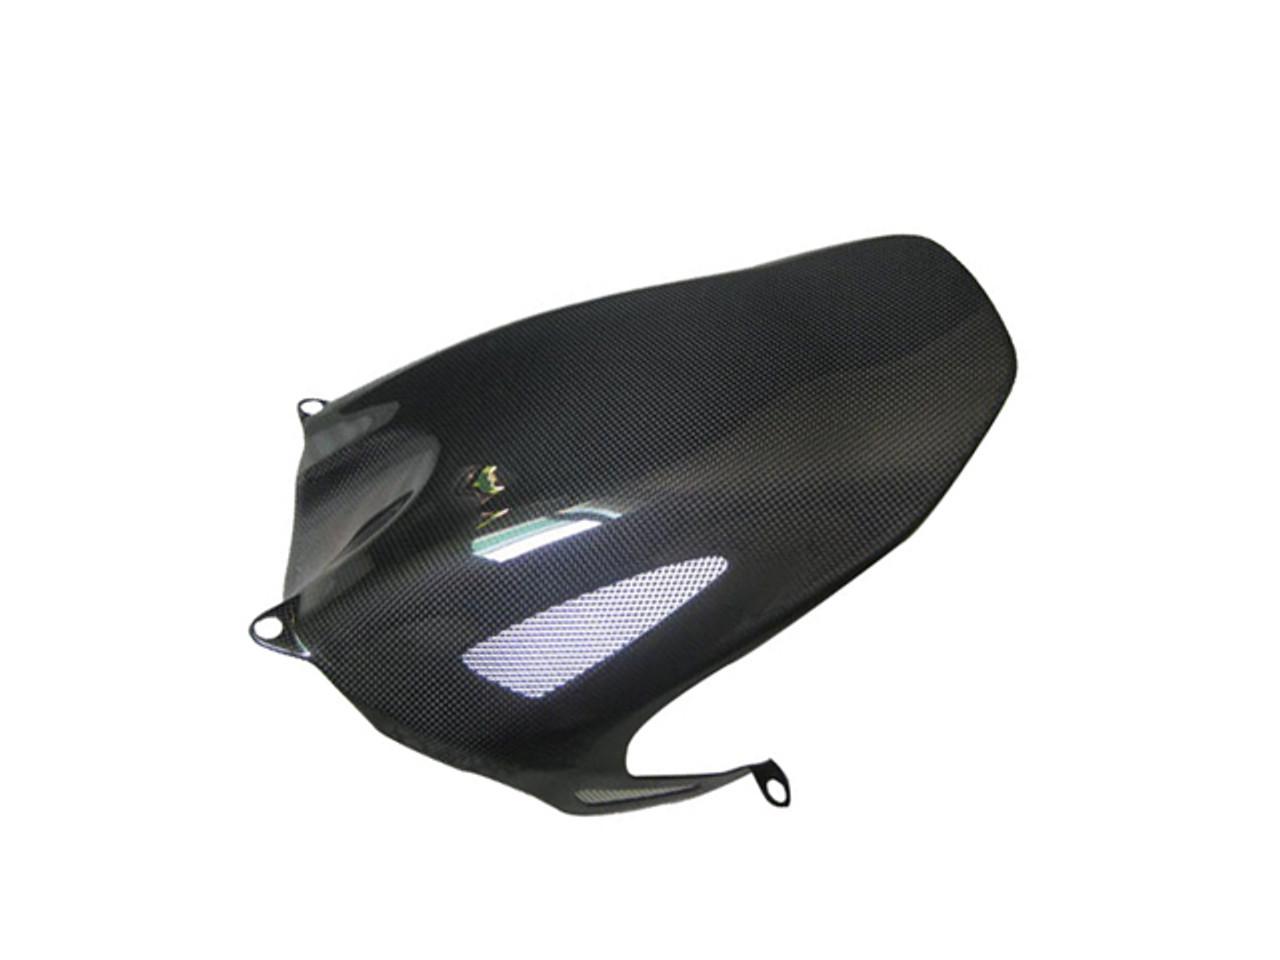 Glossy Plain Weave Carbon Fiber Rear Hugger with Racing Mesh for Honda CBR 1000RR 08-11